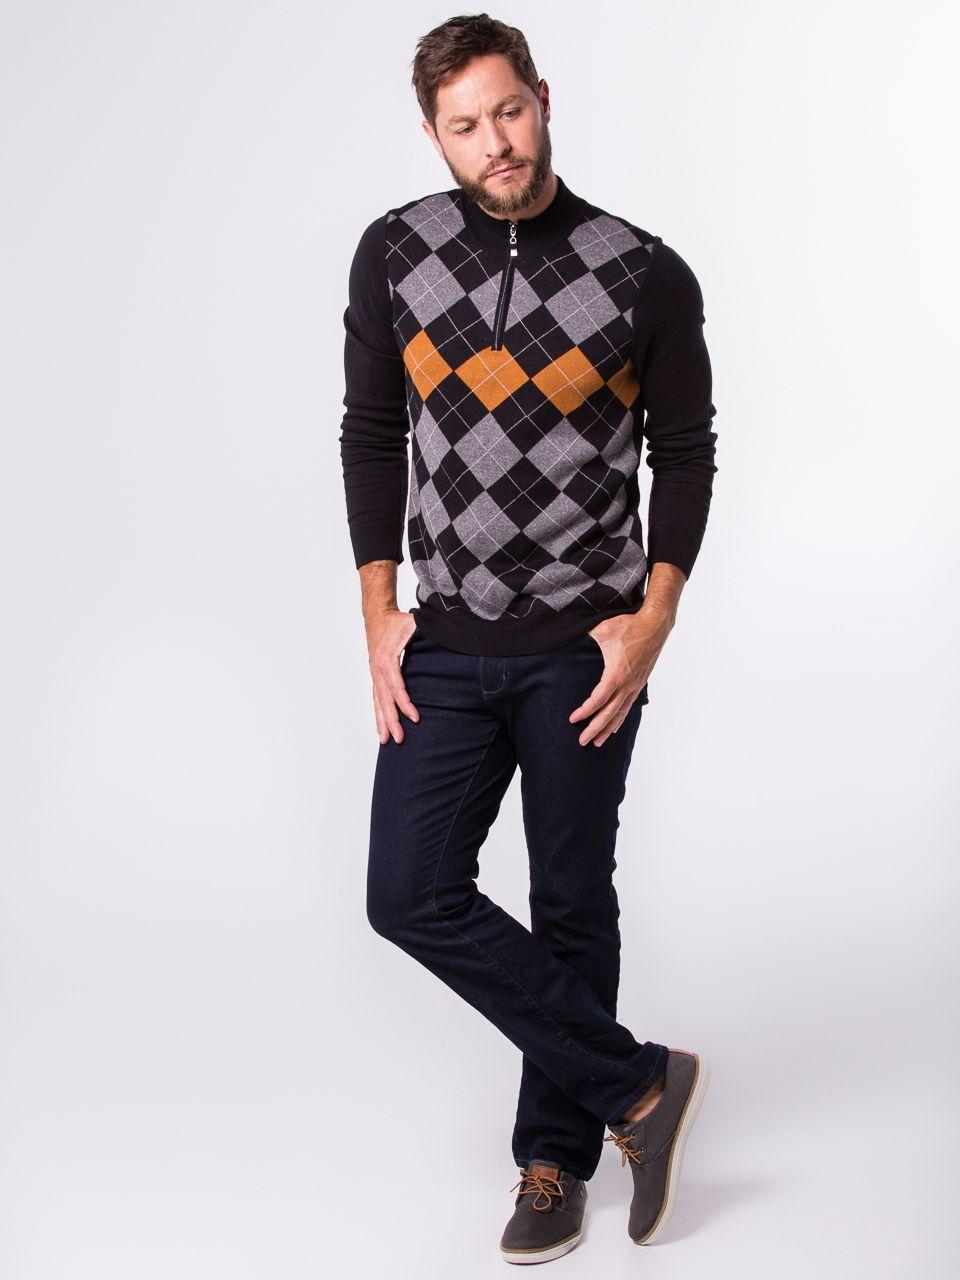 Suéter Polo com Ziper